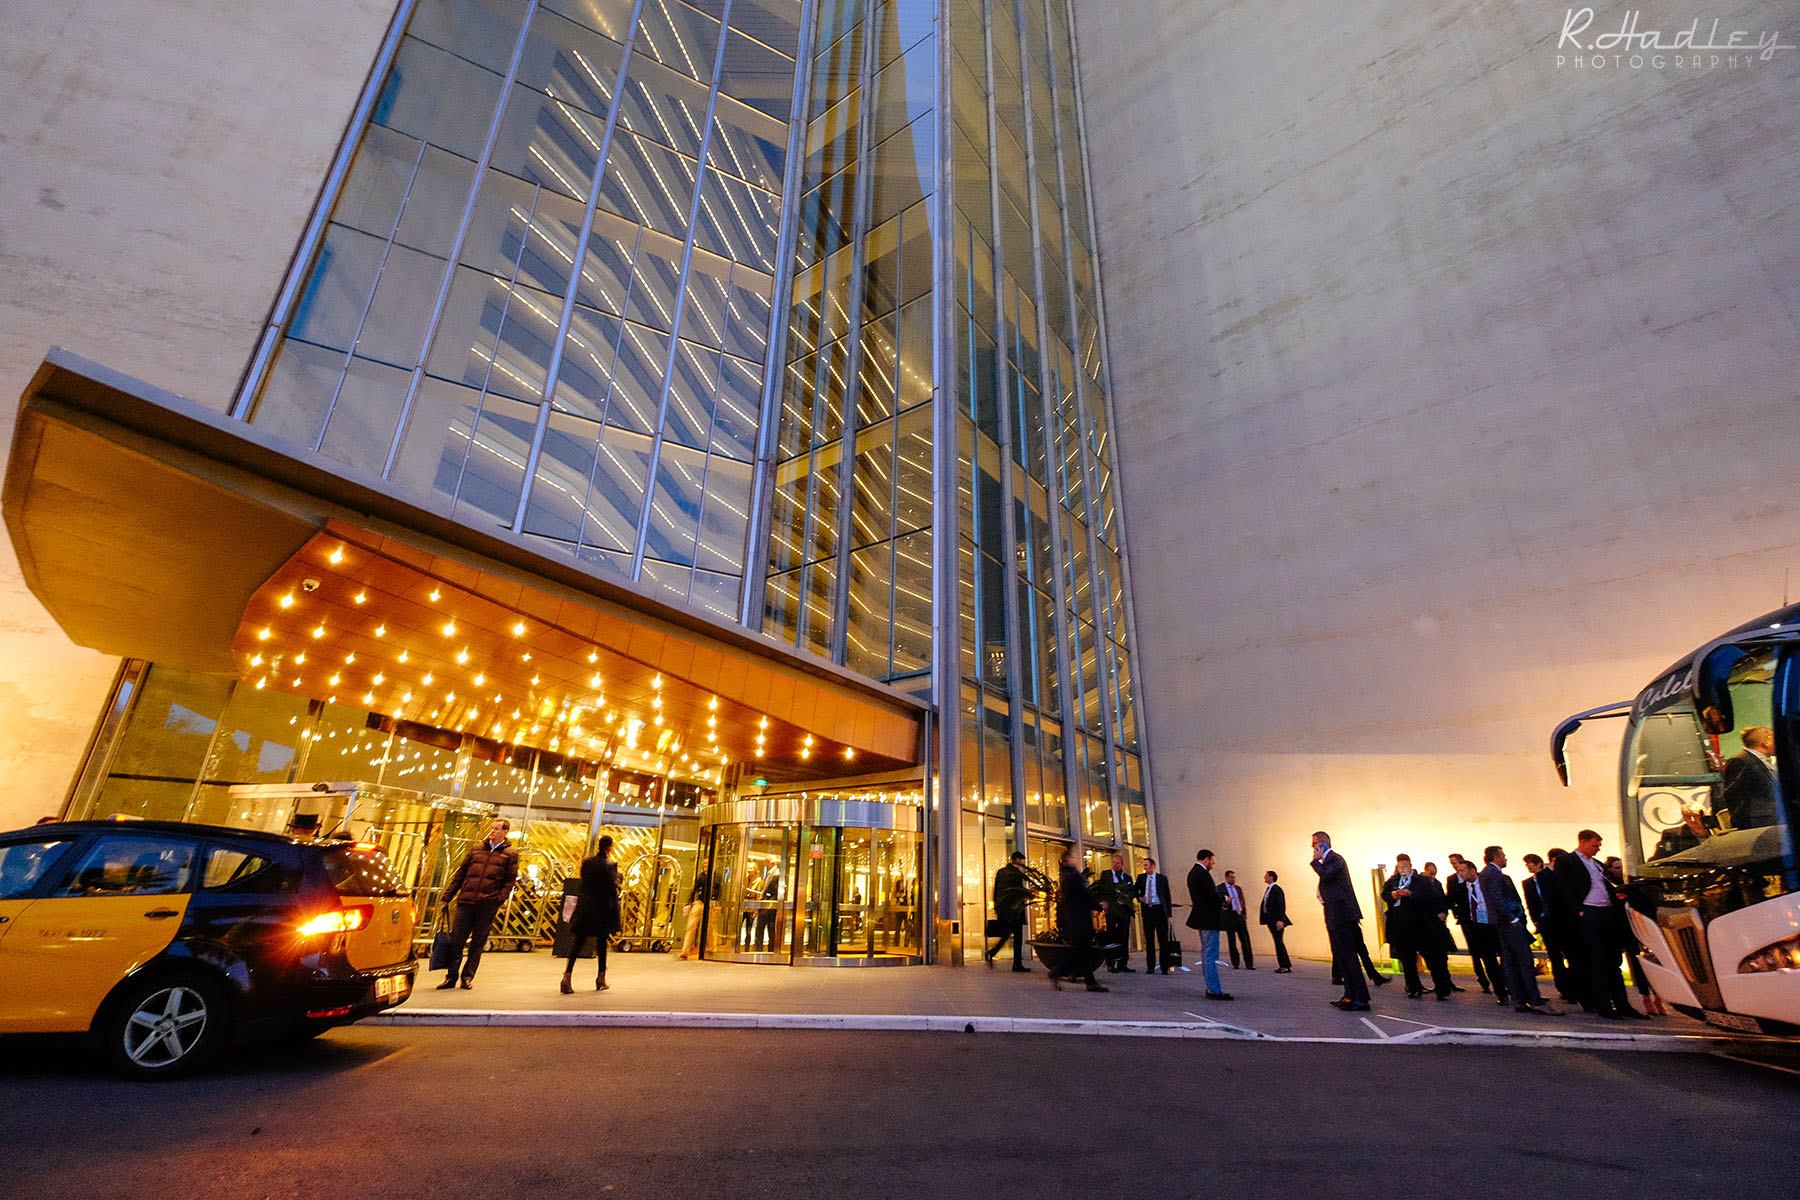 Corporate Event Photographer   Fairmont Rey Juan Carlos Hotel in Barcelona